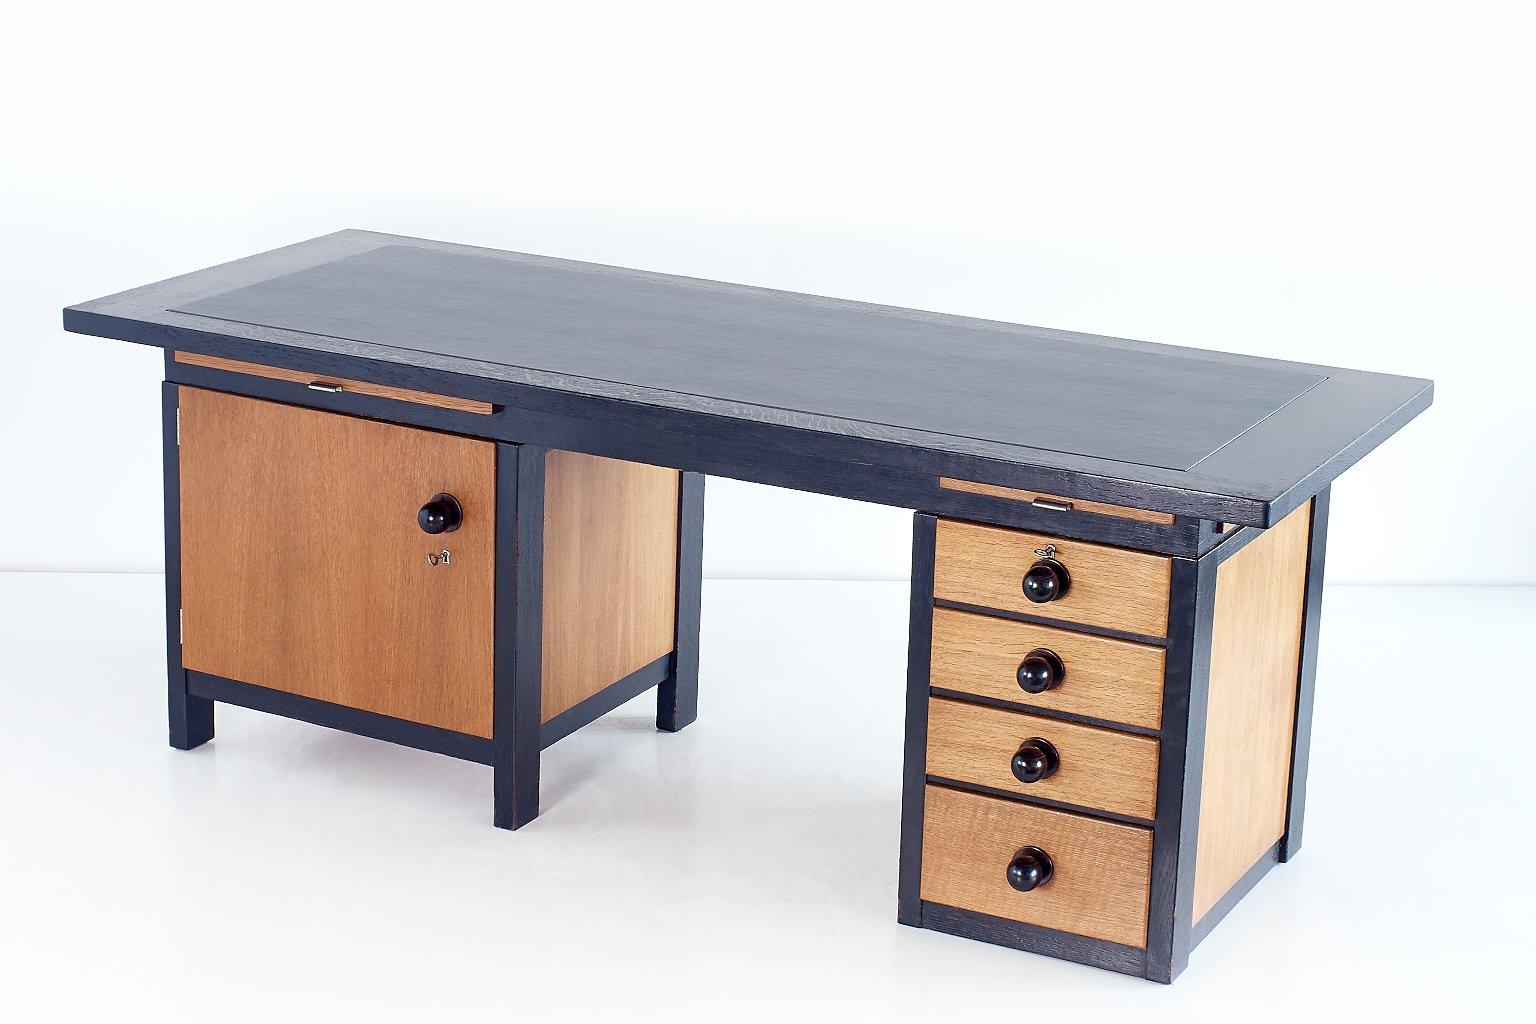 Architect 39 s desk by frits spanjaard 1932 for sale at pamono for Architecte desl definition